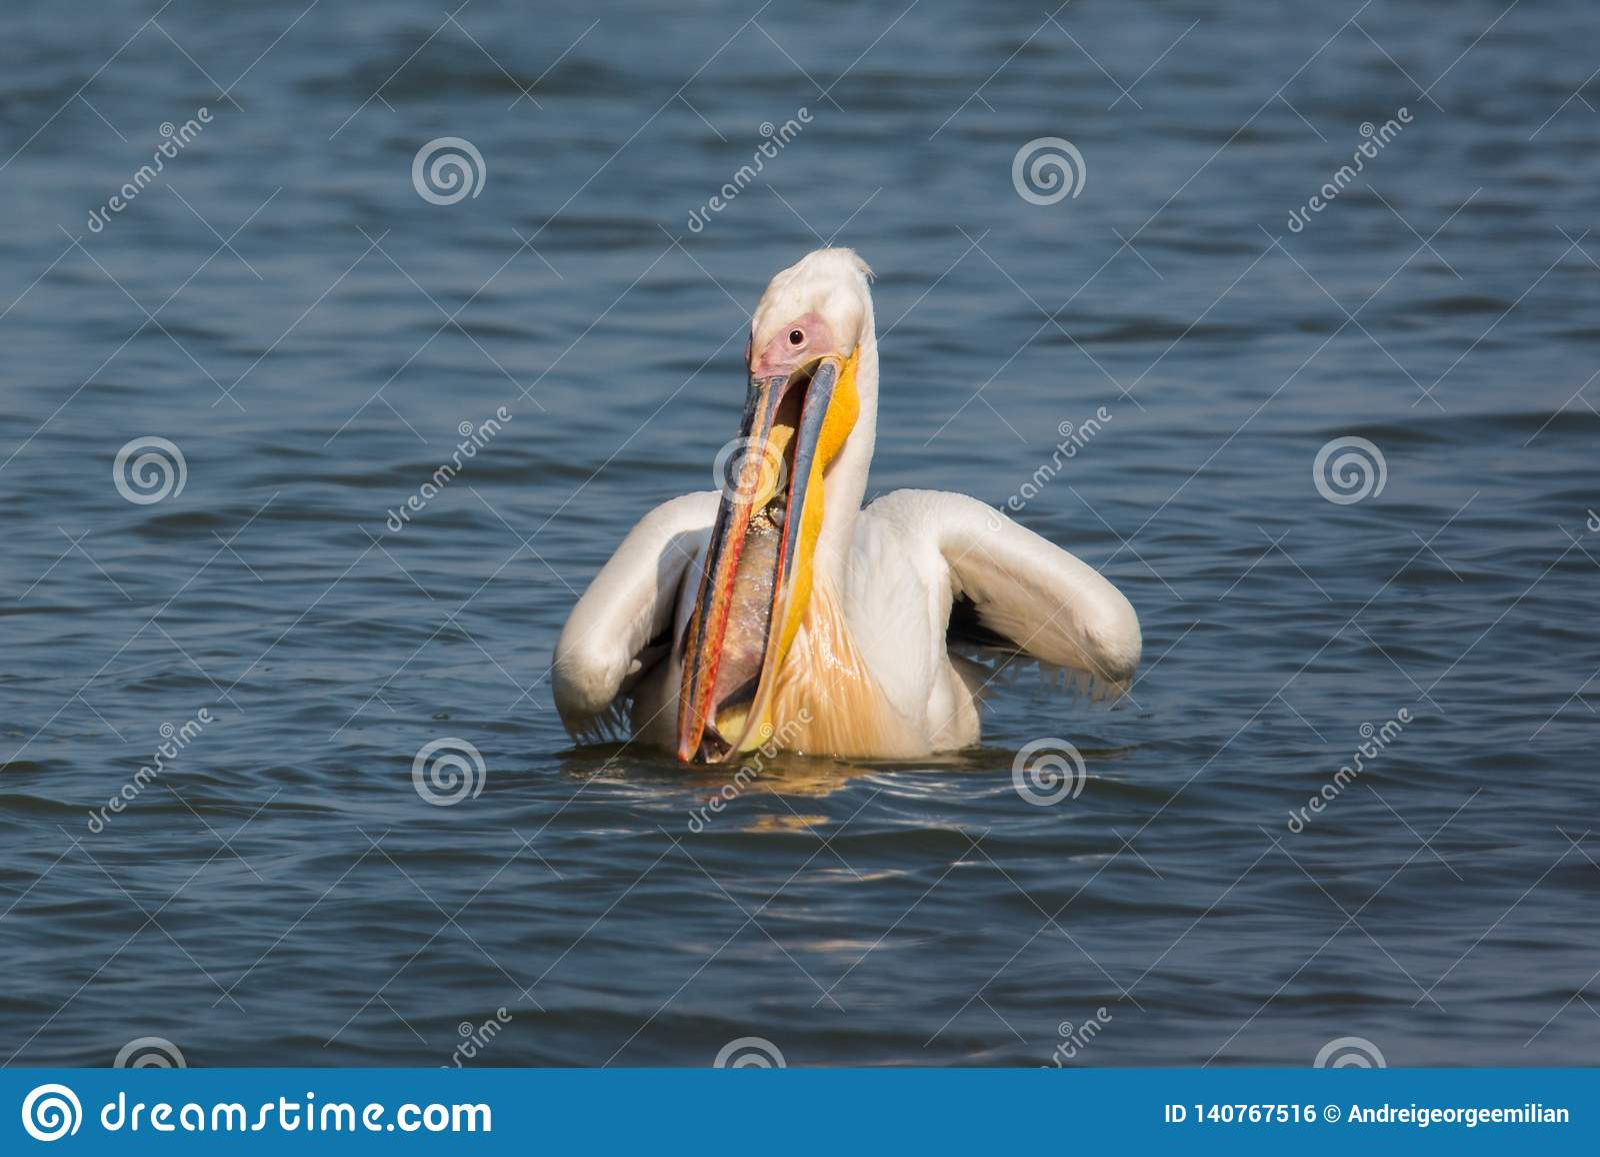 Wildlife: bigbird - common pelican eating a bigfish